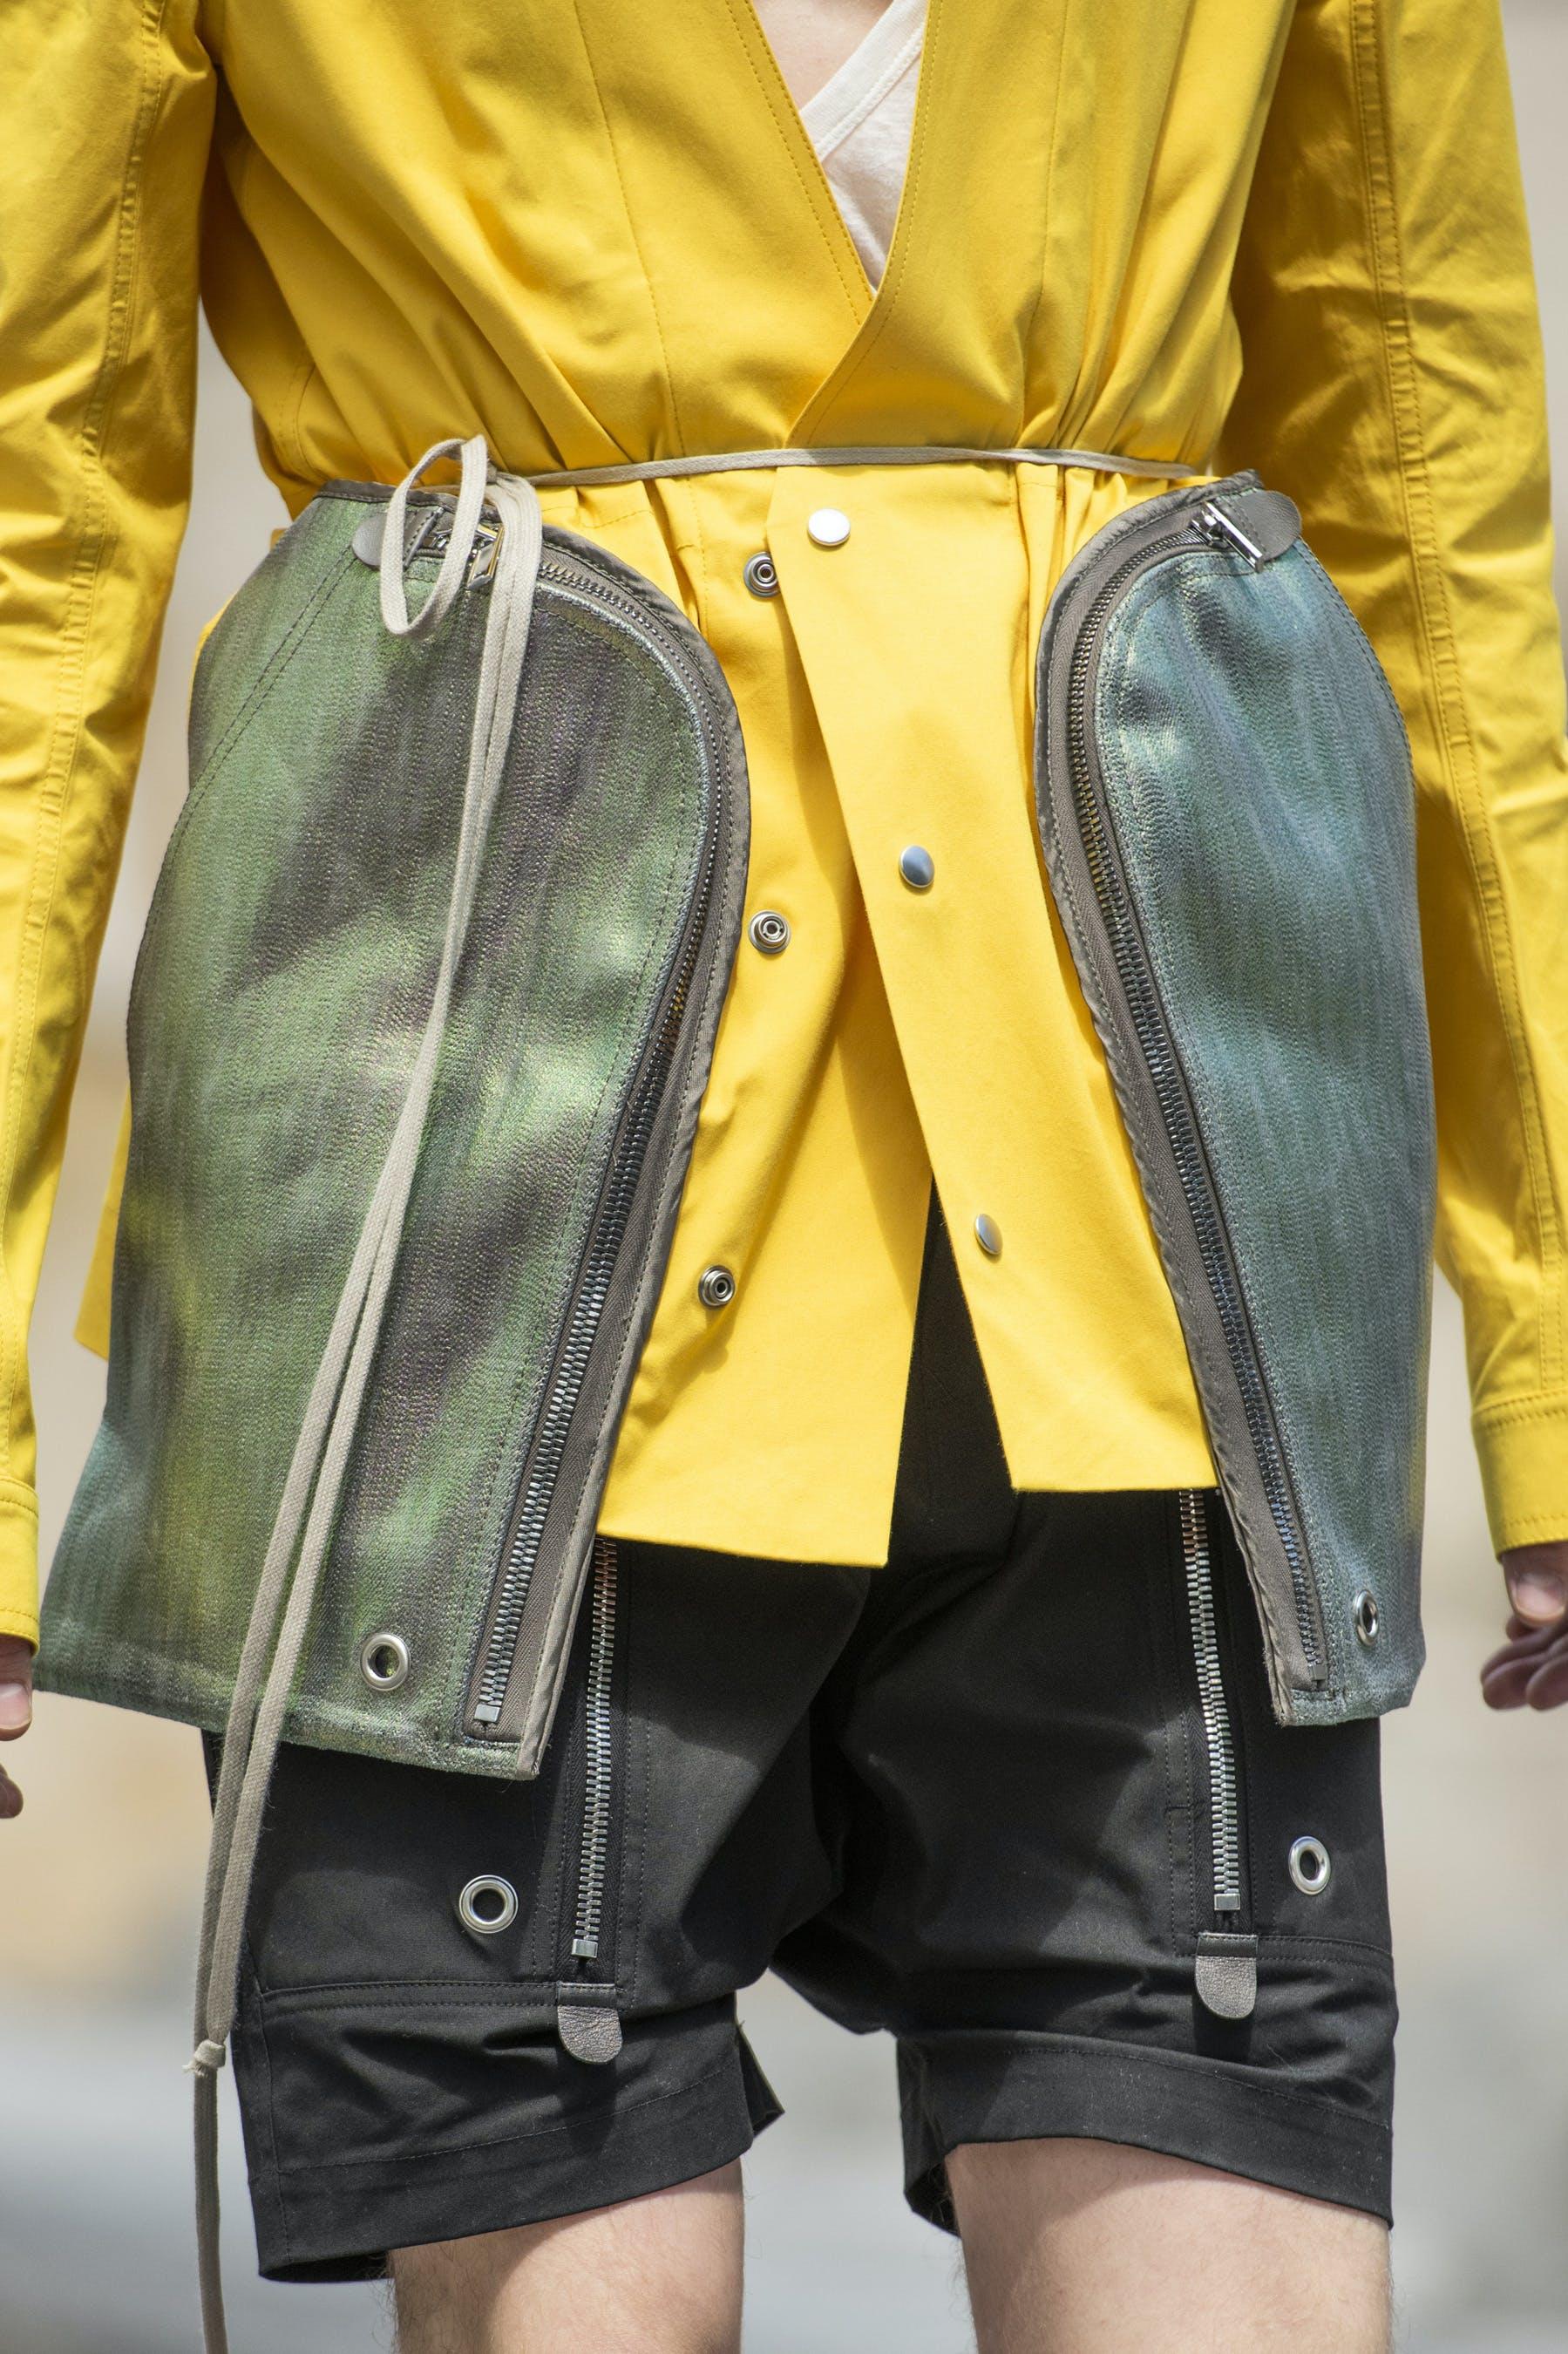 Rick Owens Runway Details Off The Runway Bauhaus Jacket In Lemon Yellow With Iridescent Pockets Cargo Pods In Black Mens SS20 Tecautl